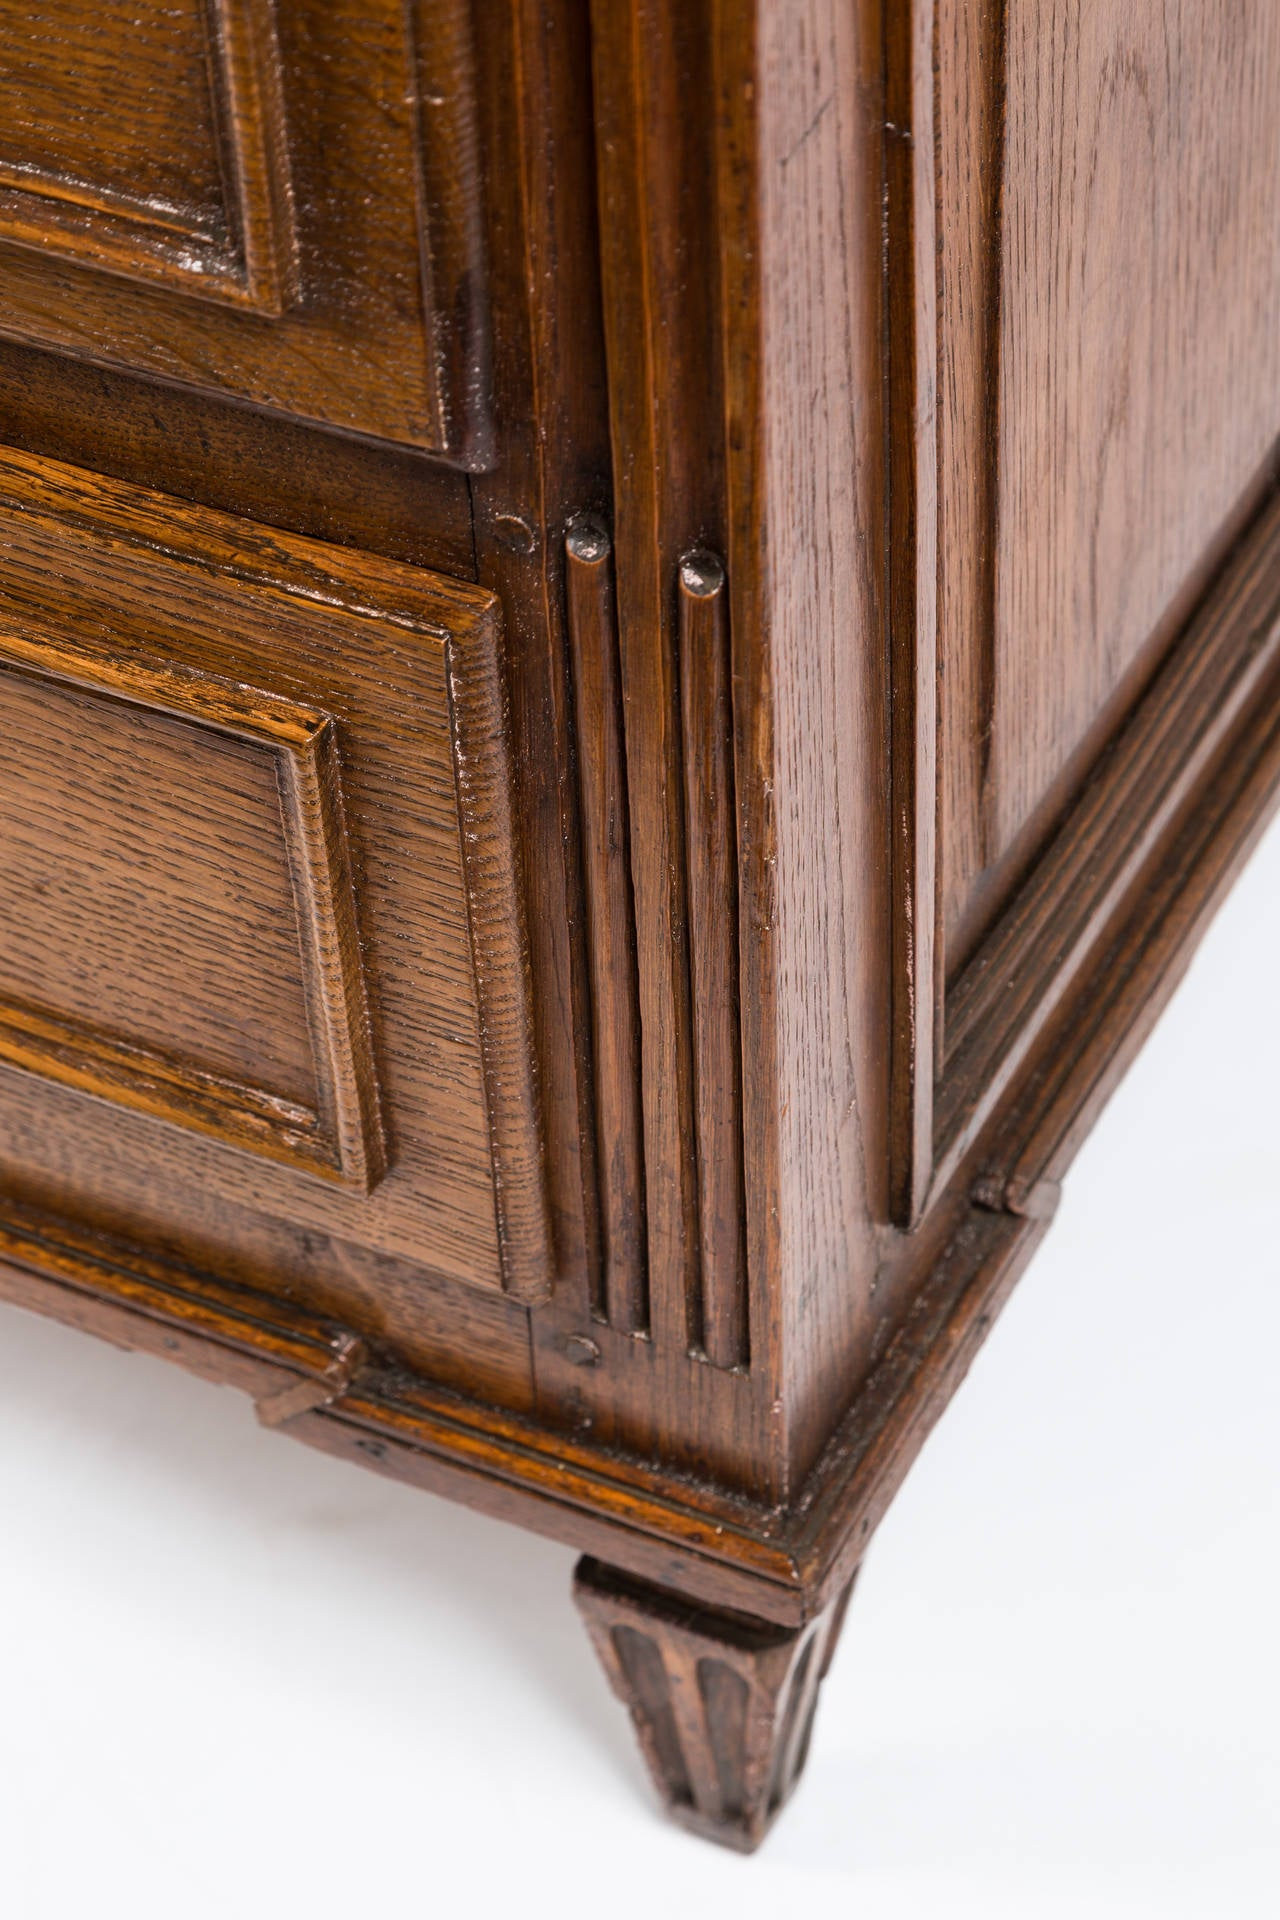 18th Century French Louis XVI Dresser in Solid Oak 6